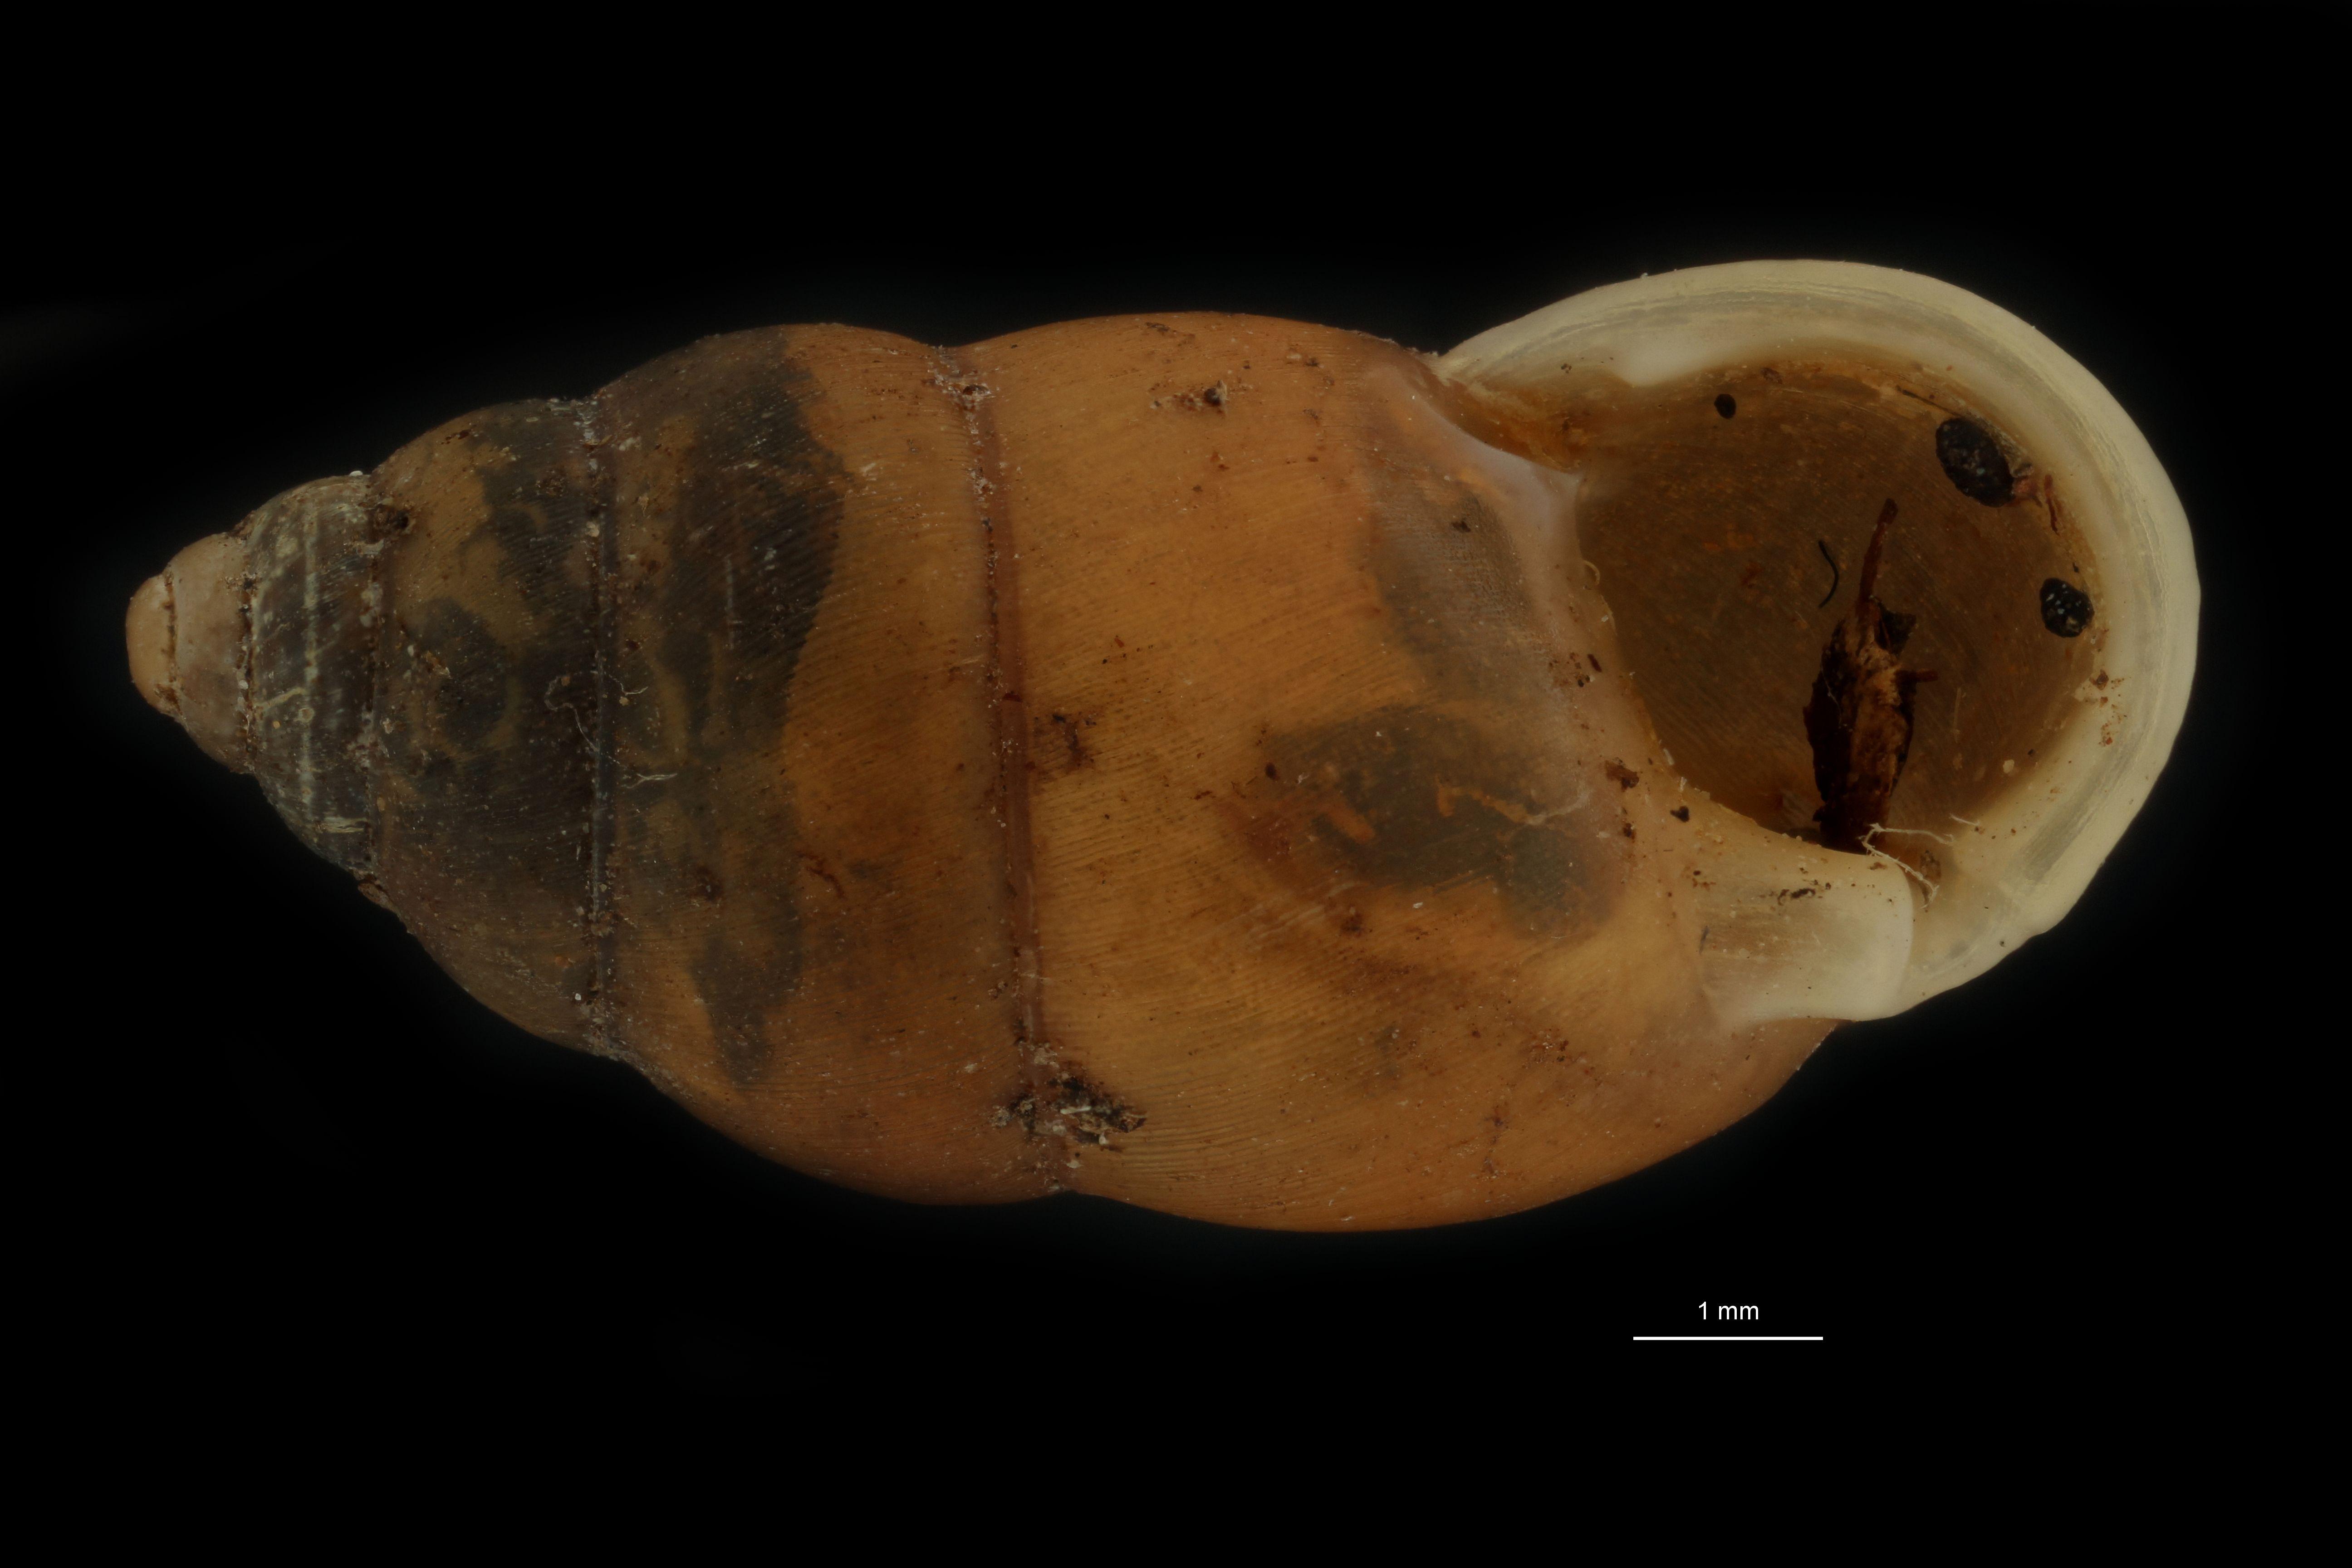 BE-RBINS-INV MT 954 Pupinella (Pupinopsis) fruhstorferi var. tsushimana pt F.jpg